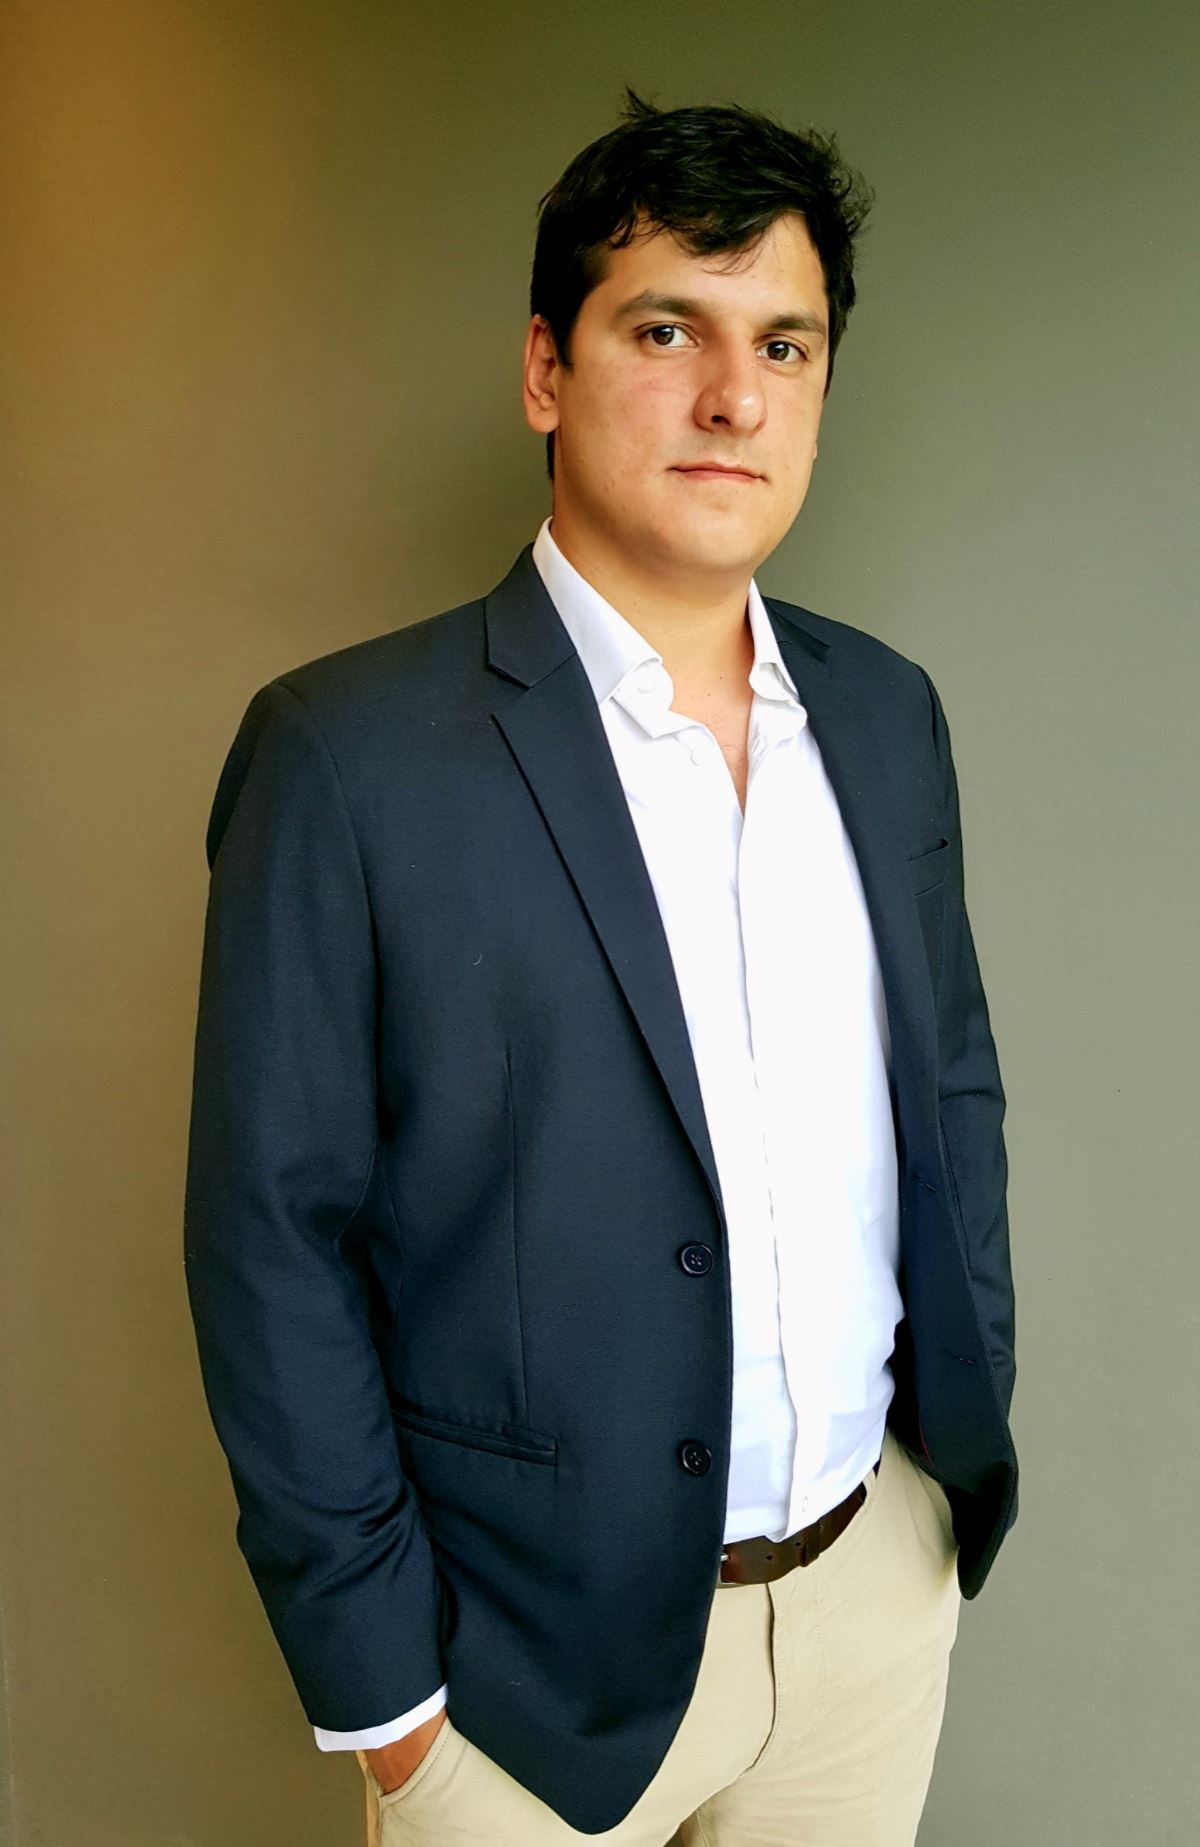 Maxi Tuero